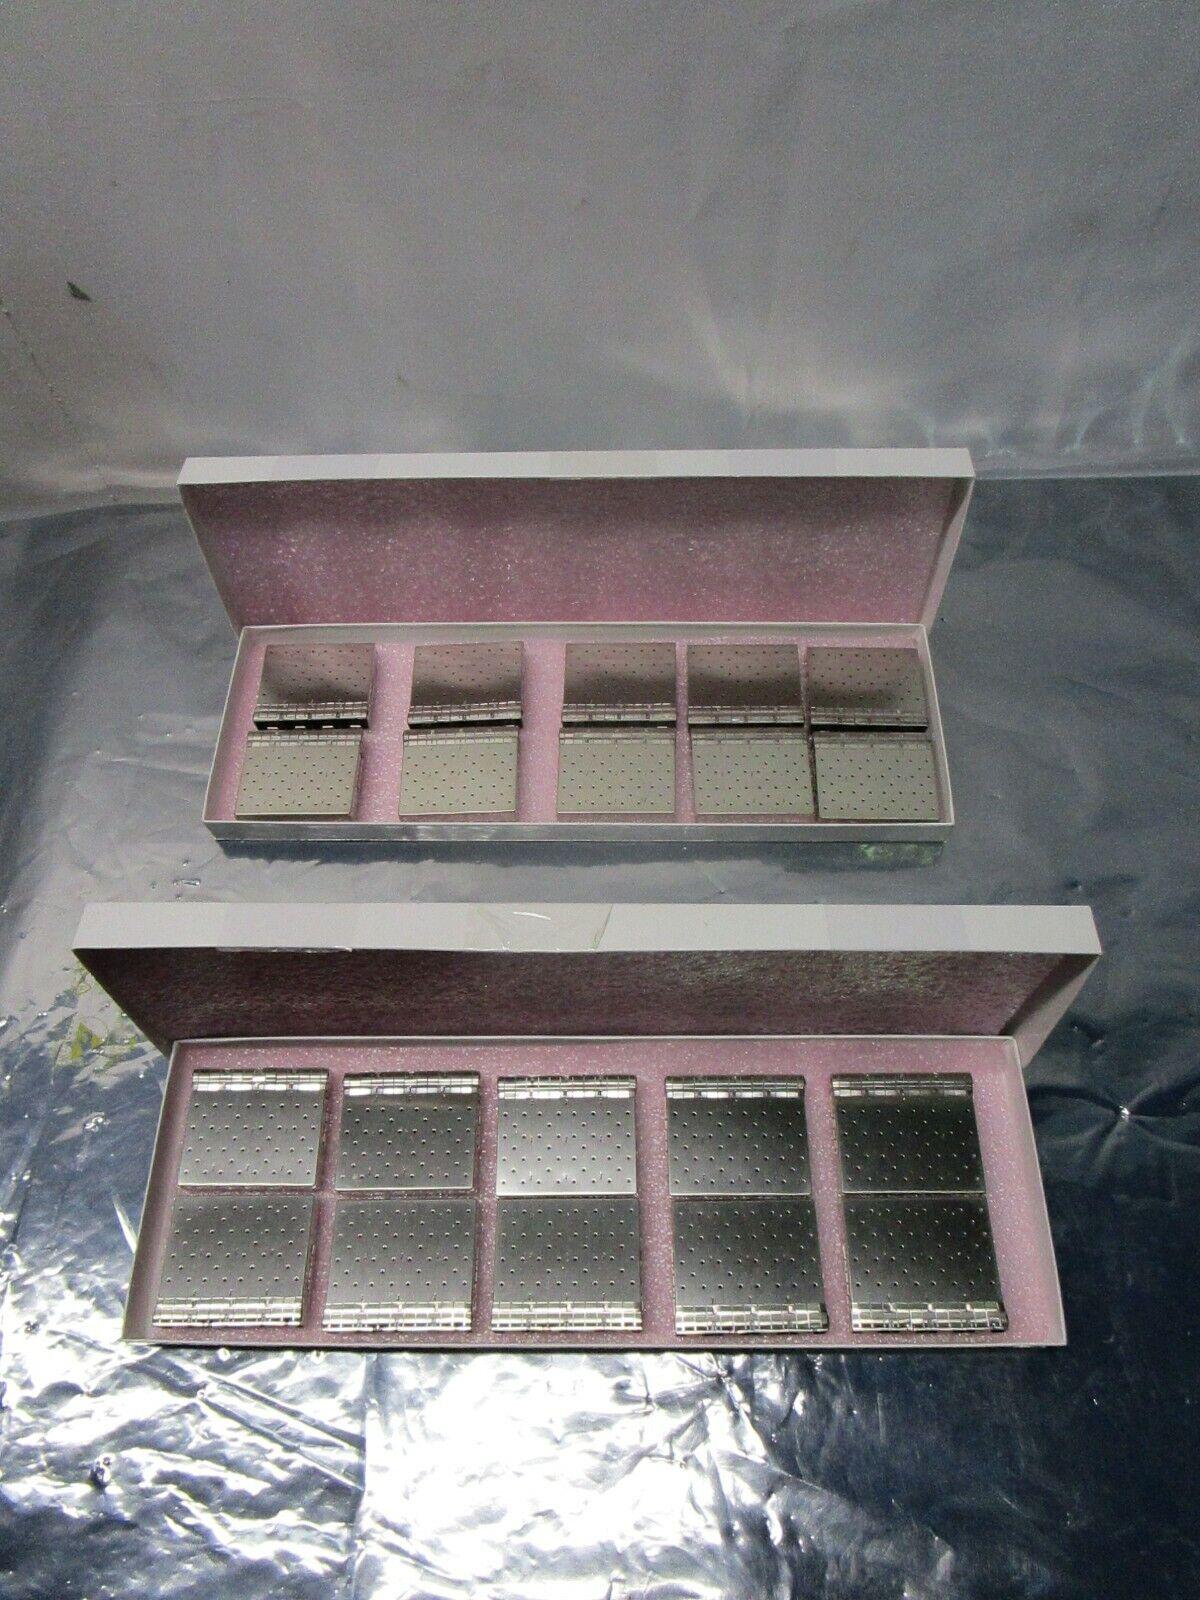 1 Lot of 10 Molex 0747541420 1X4 SFP+ Cage Press Fit w/Spring, 102556